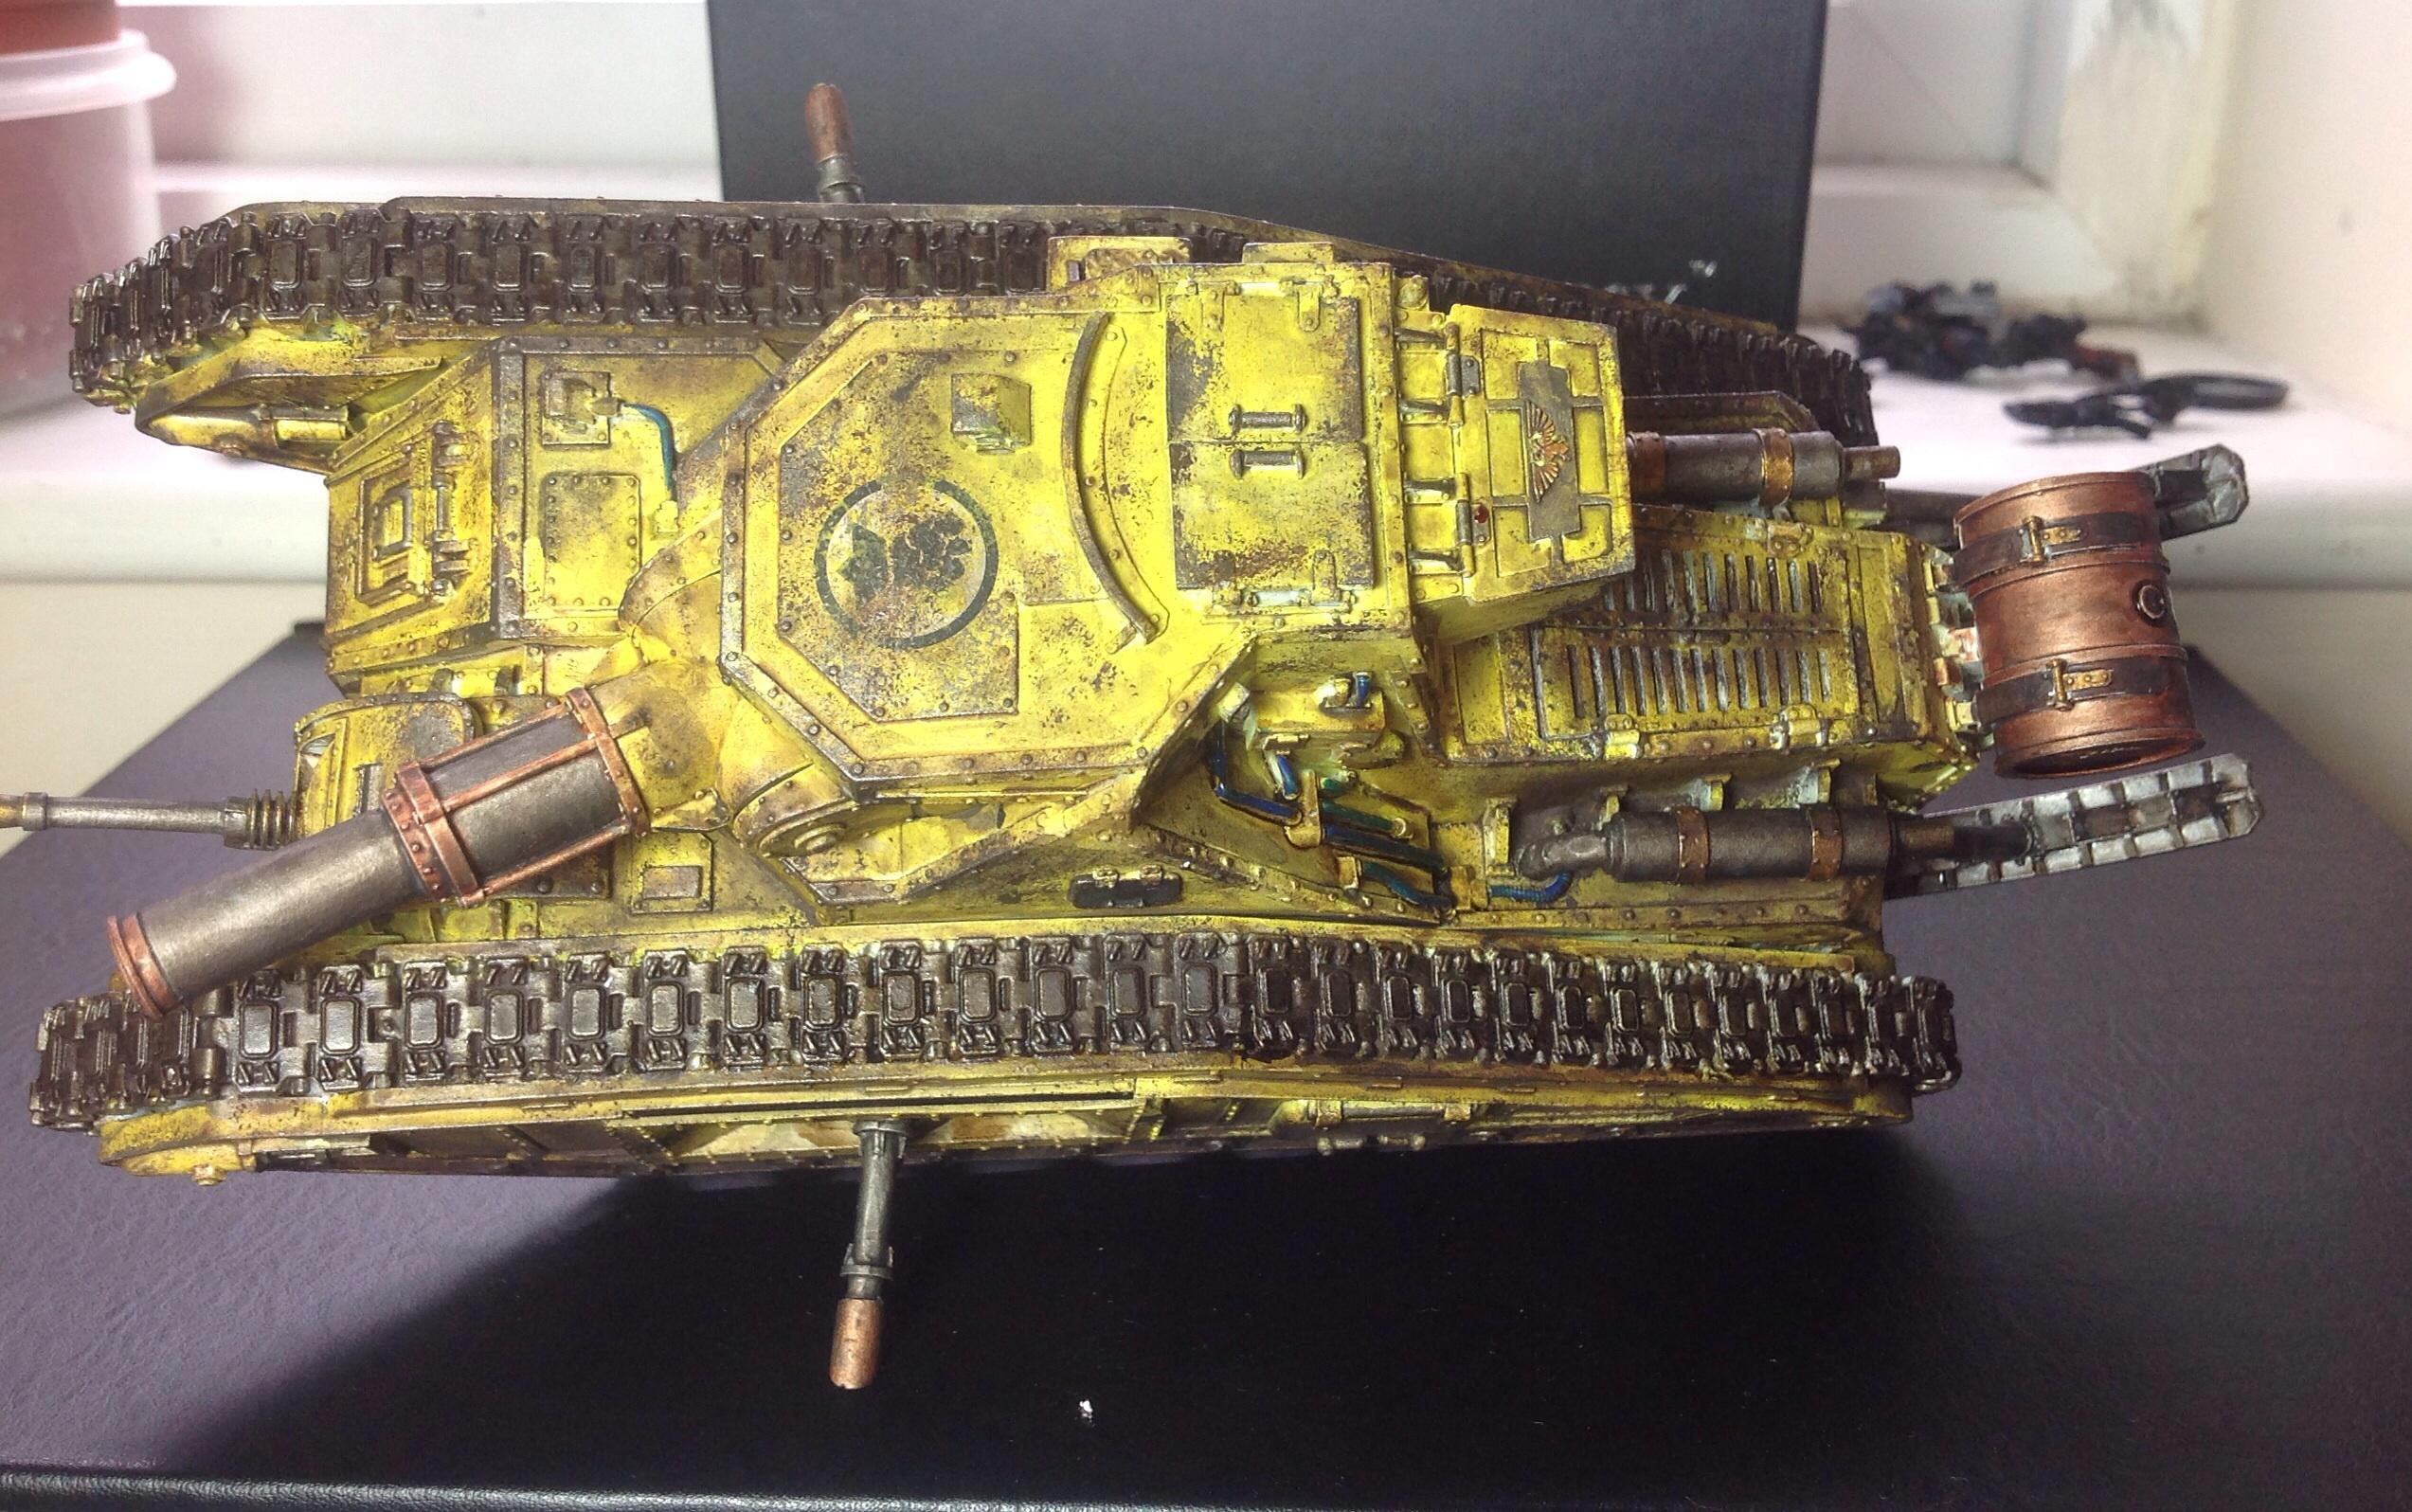 Astra Militarum, Battle Tank, Forge World, Gianlucafiorentini123, Imperial Guard, Macharius, Tank, Warhammer 40,000, Yellow